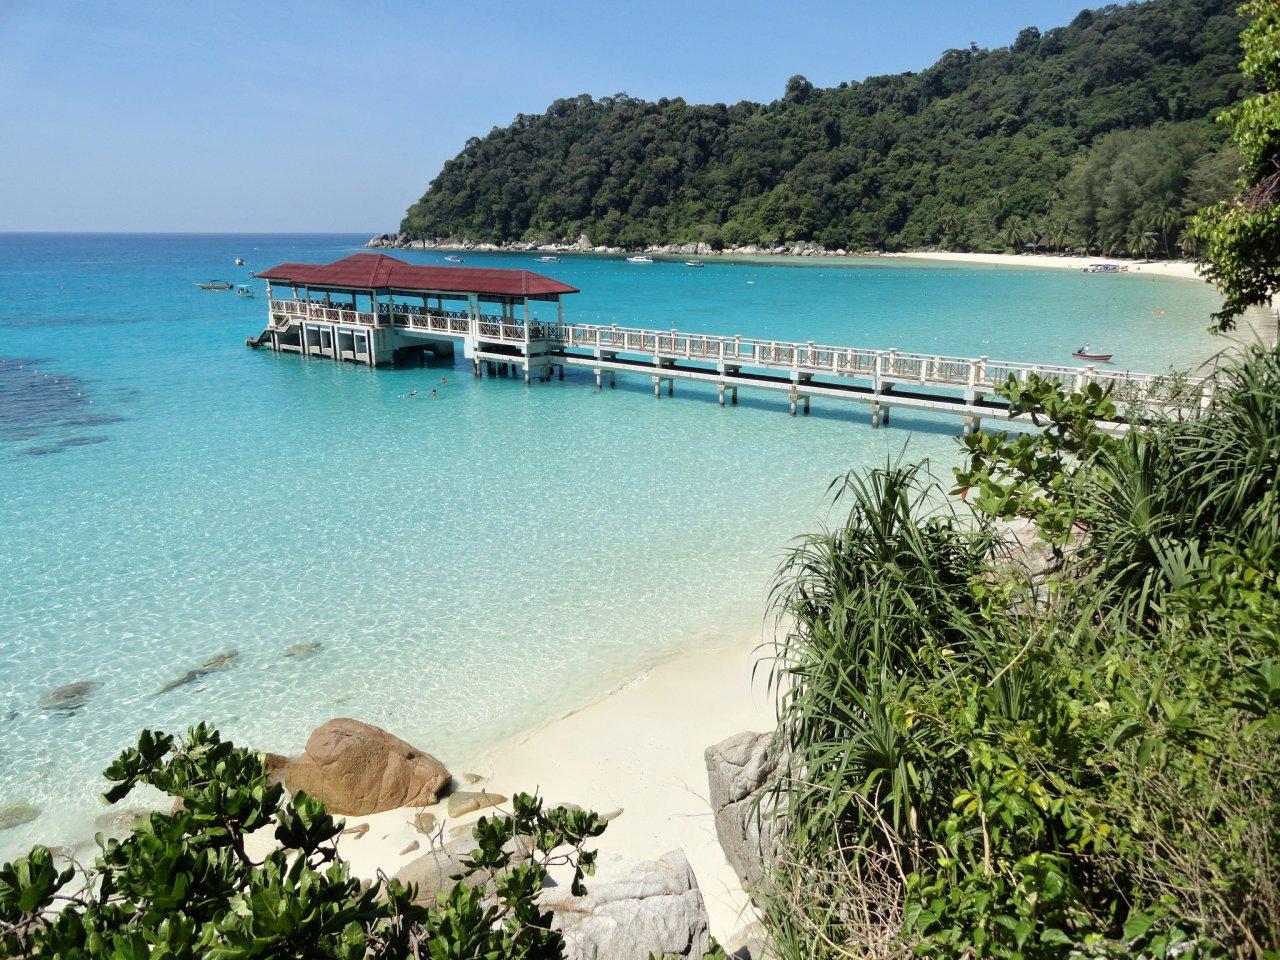 Perhentian Island Resort (PIR) Beach, Perhentian Besar, Malaysia